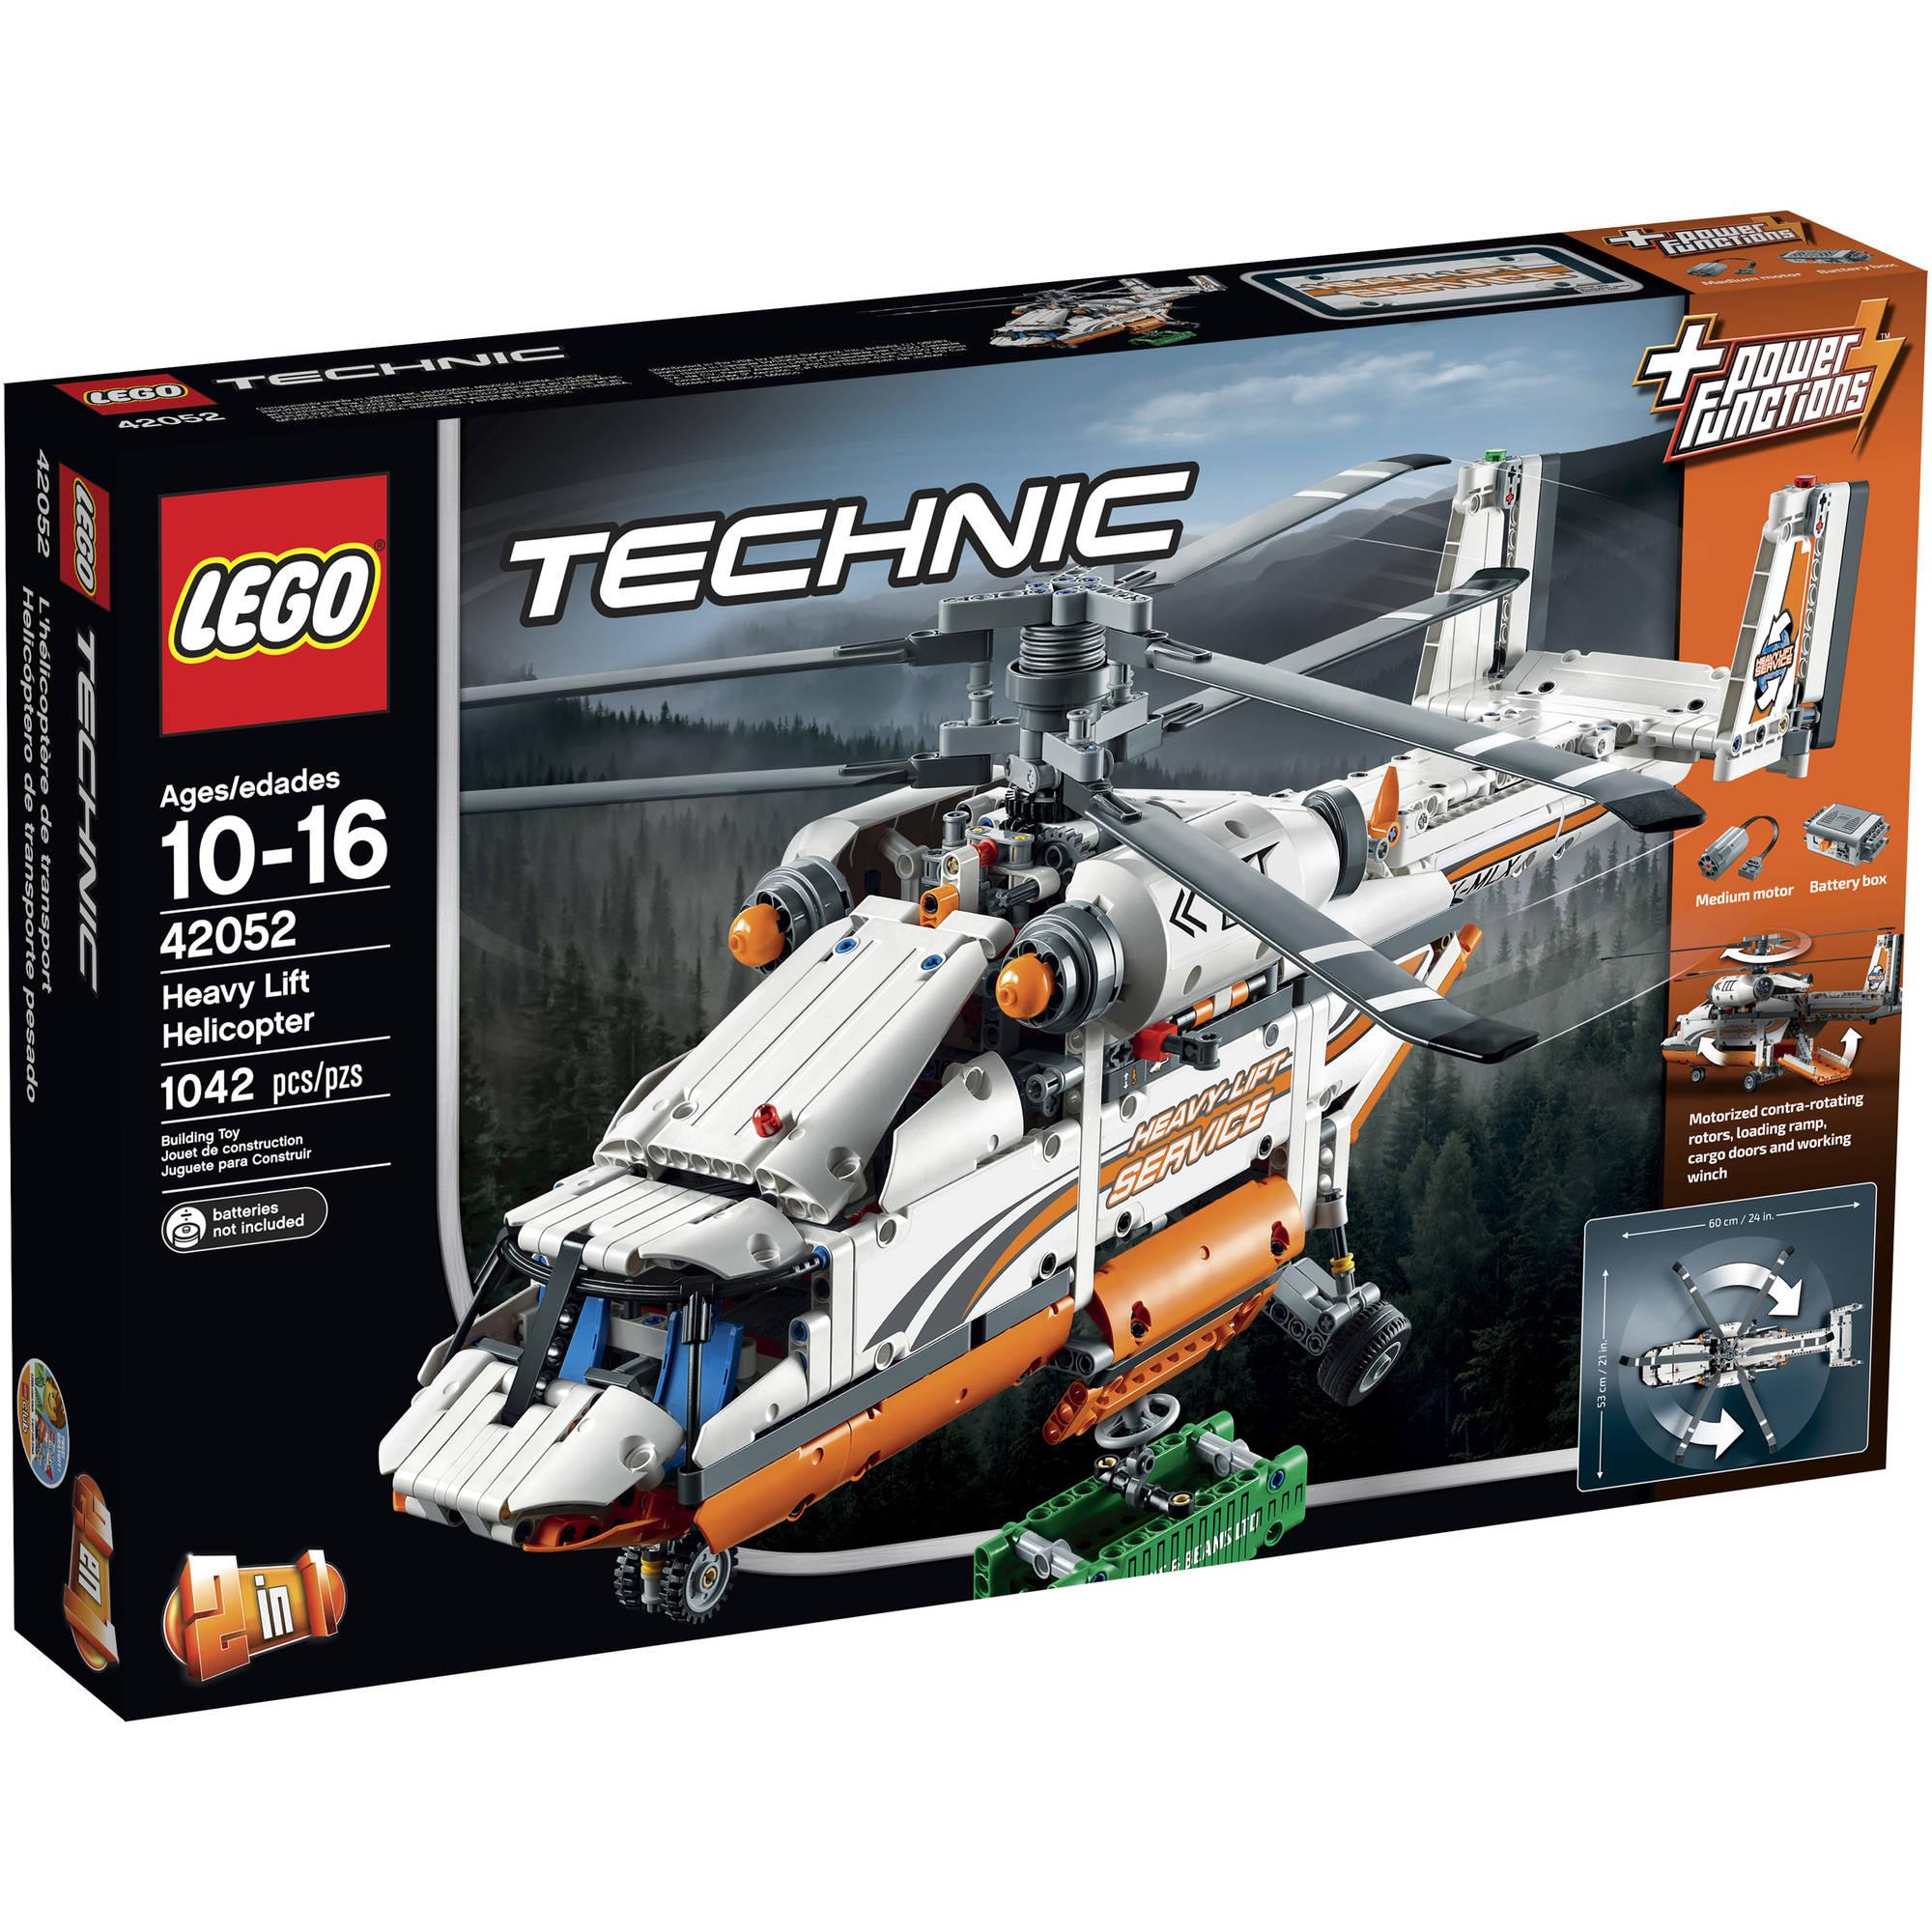 LEGO Technic Heavy Lift Helicopter, 42052